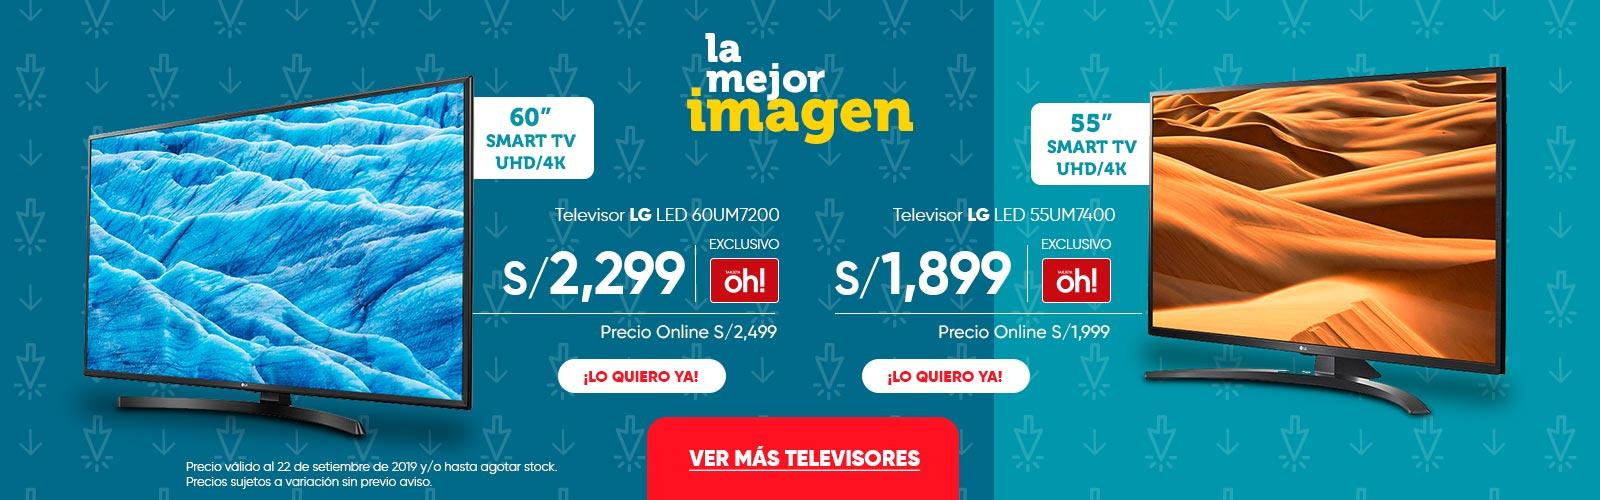 Televisor LG LED 60UM7200 55UM7400